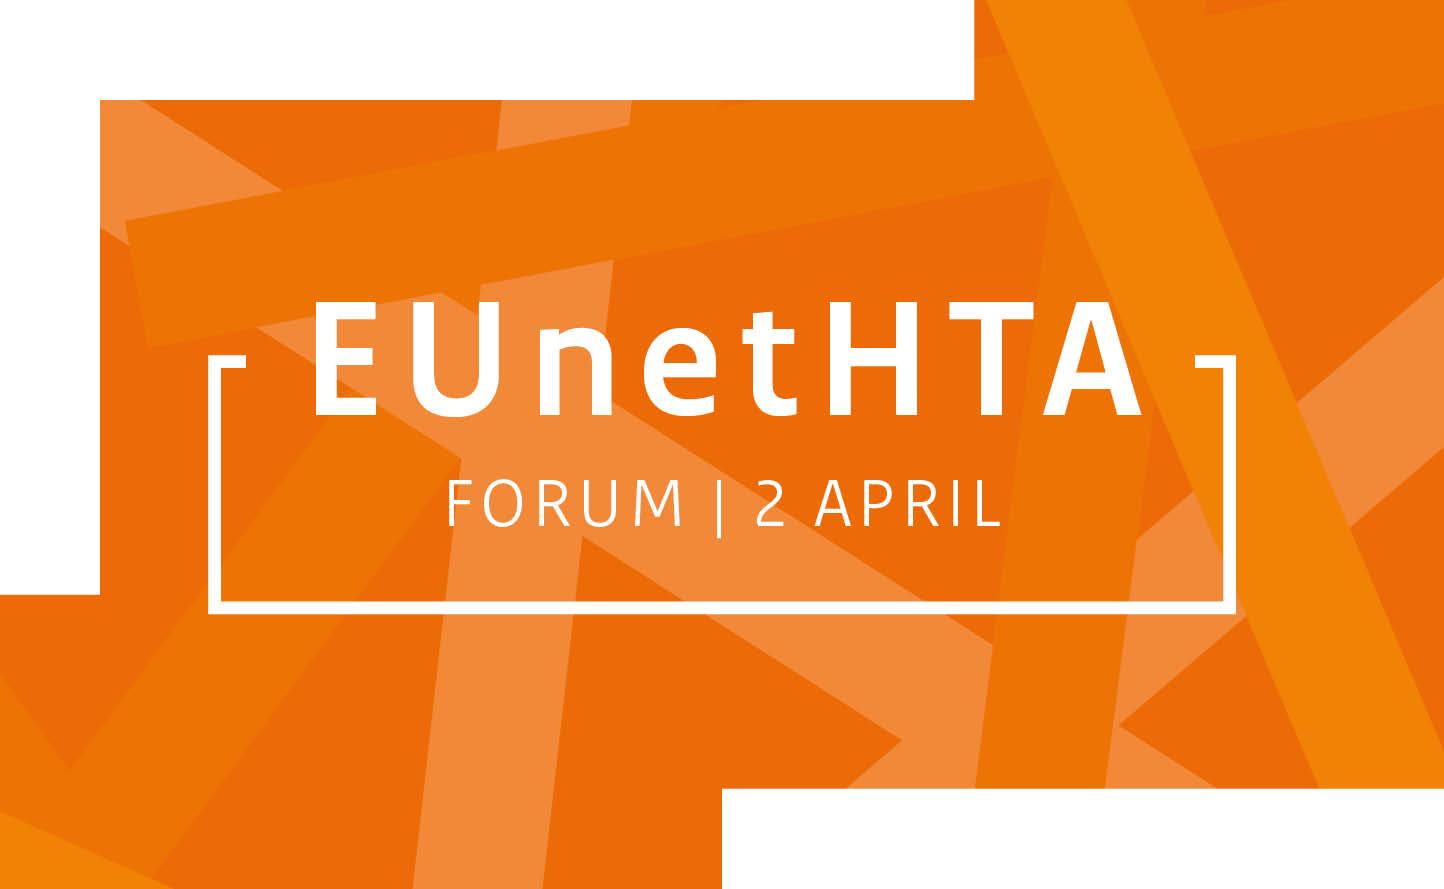 EUnetHTA 2020 Forum – Registration Now Open!